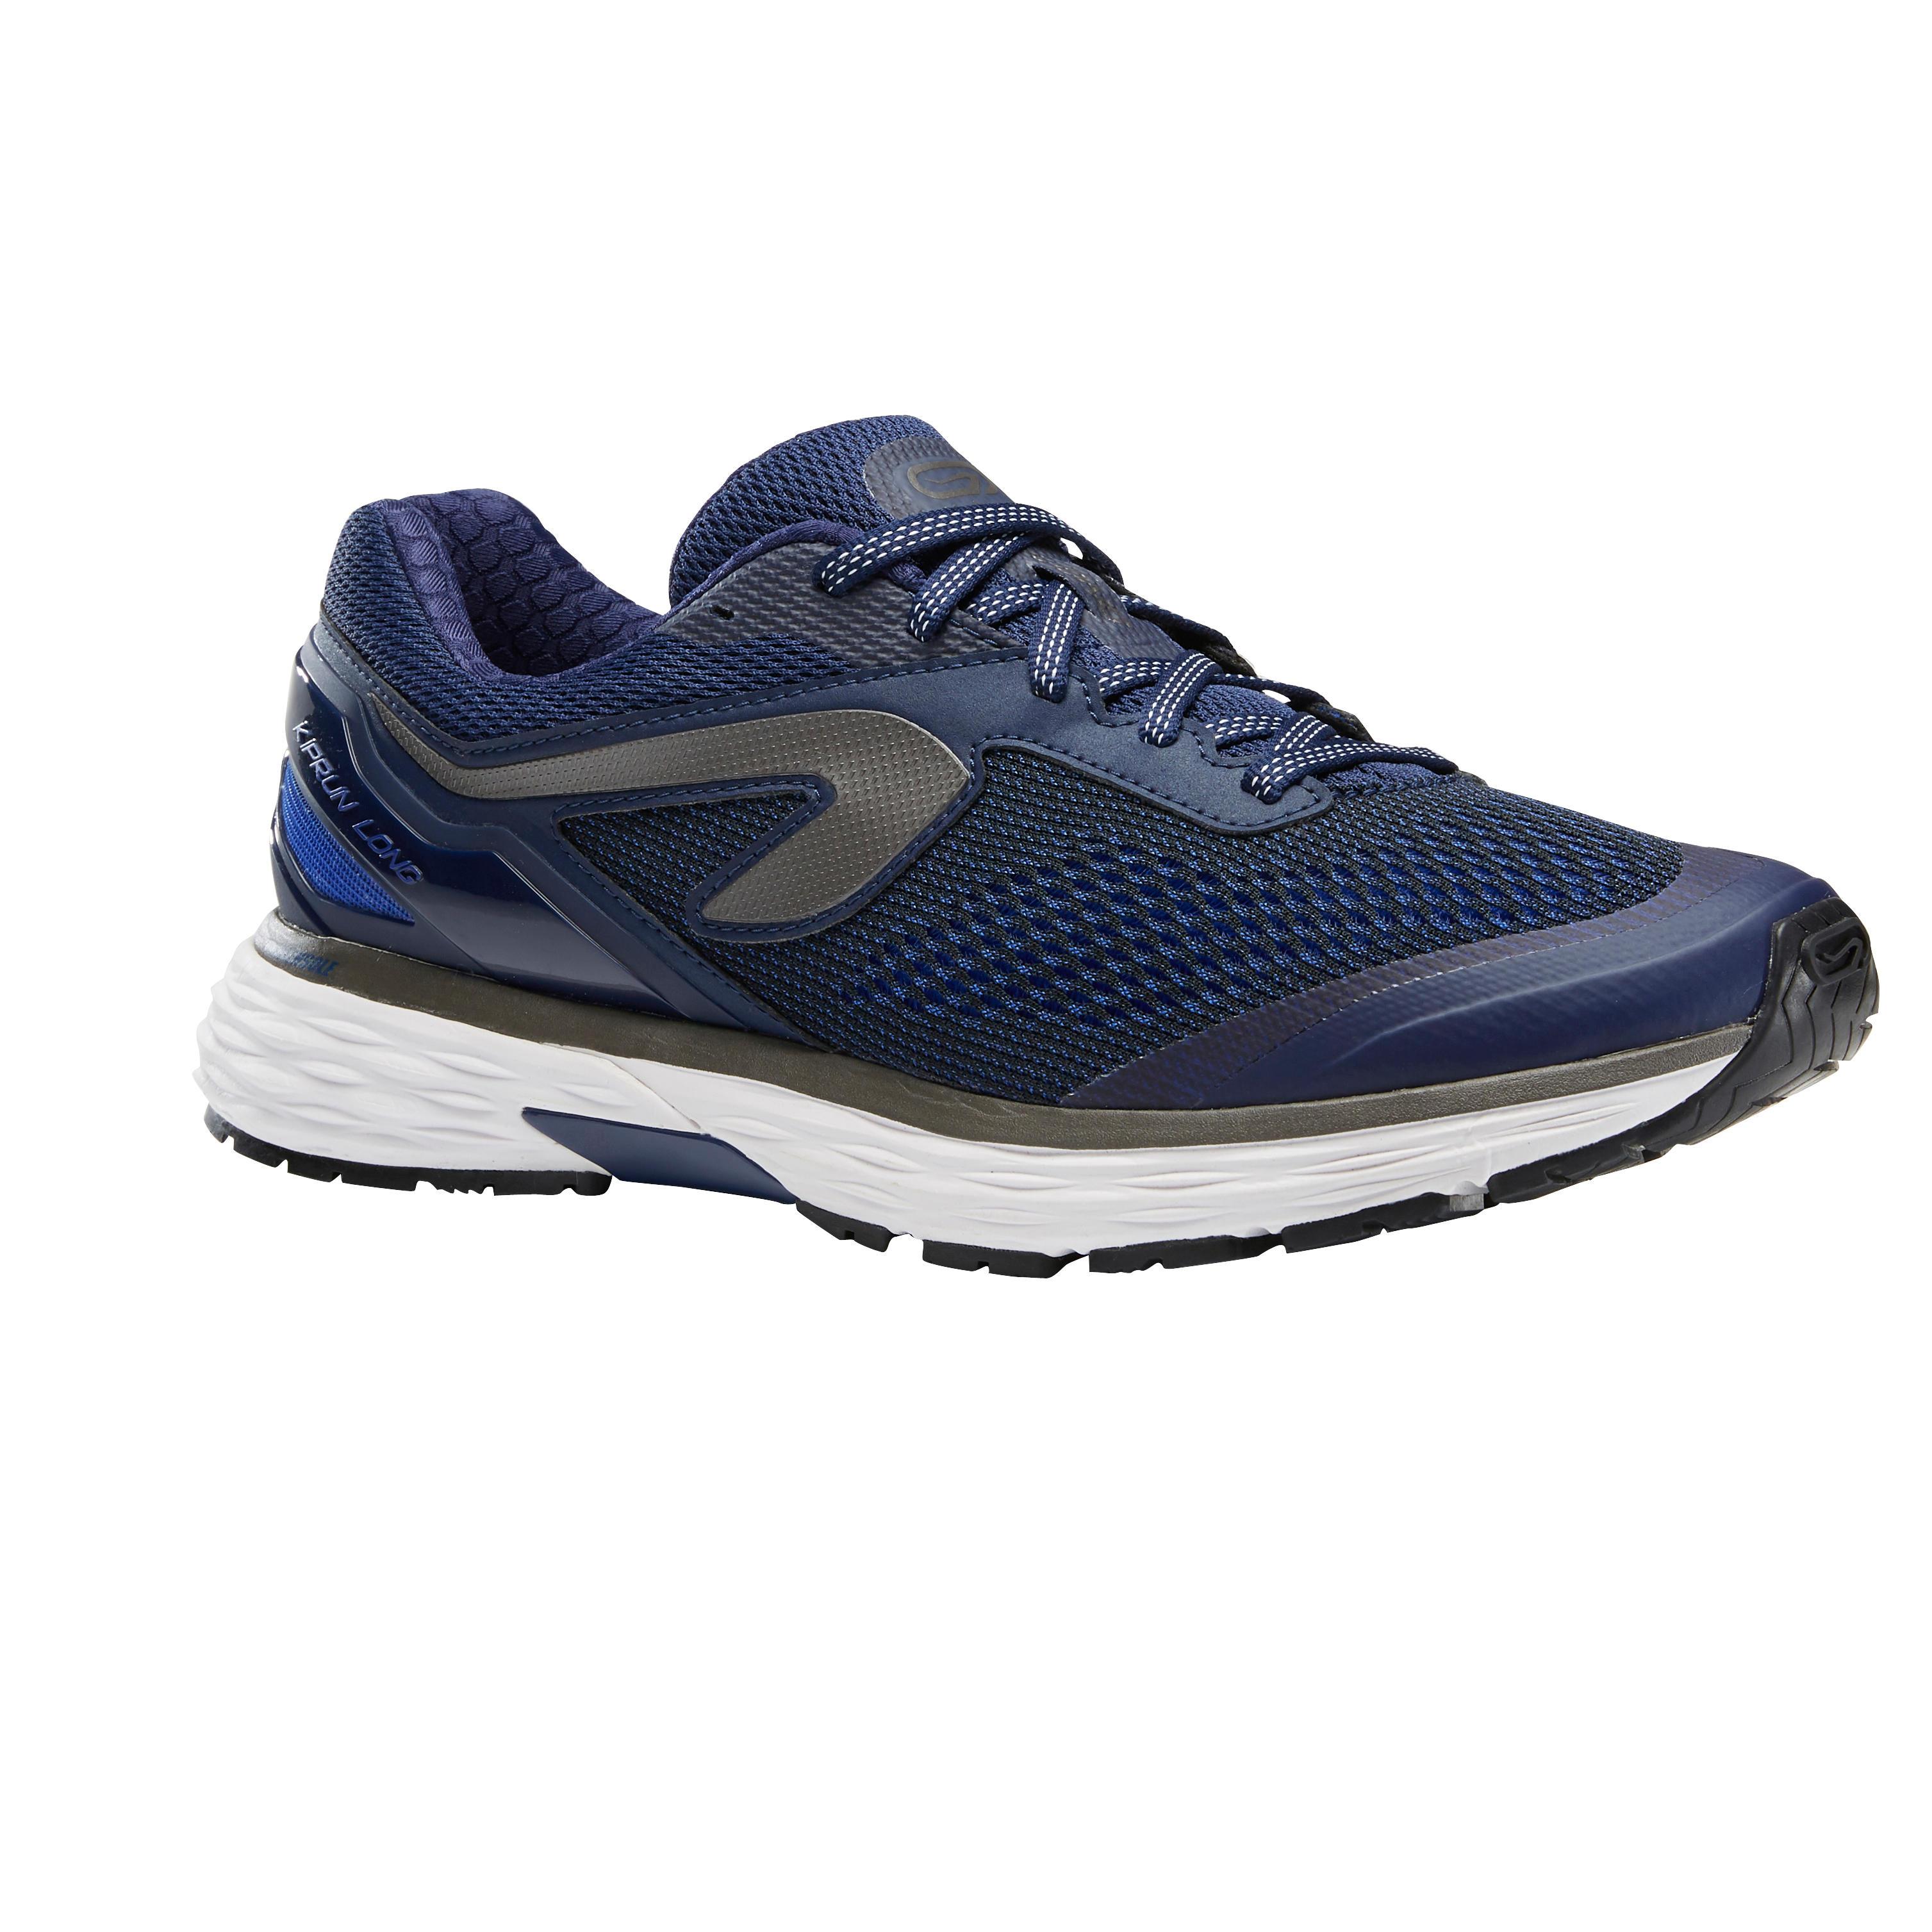 Laufschuhe Kiprun Long Herren | Schuhe > Sportschuhe > Laufschuhe | Kiprun